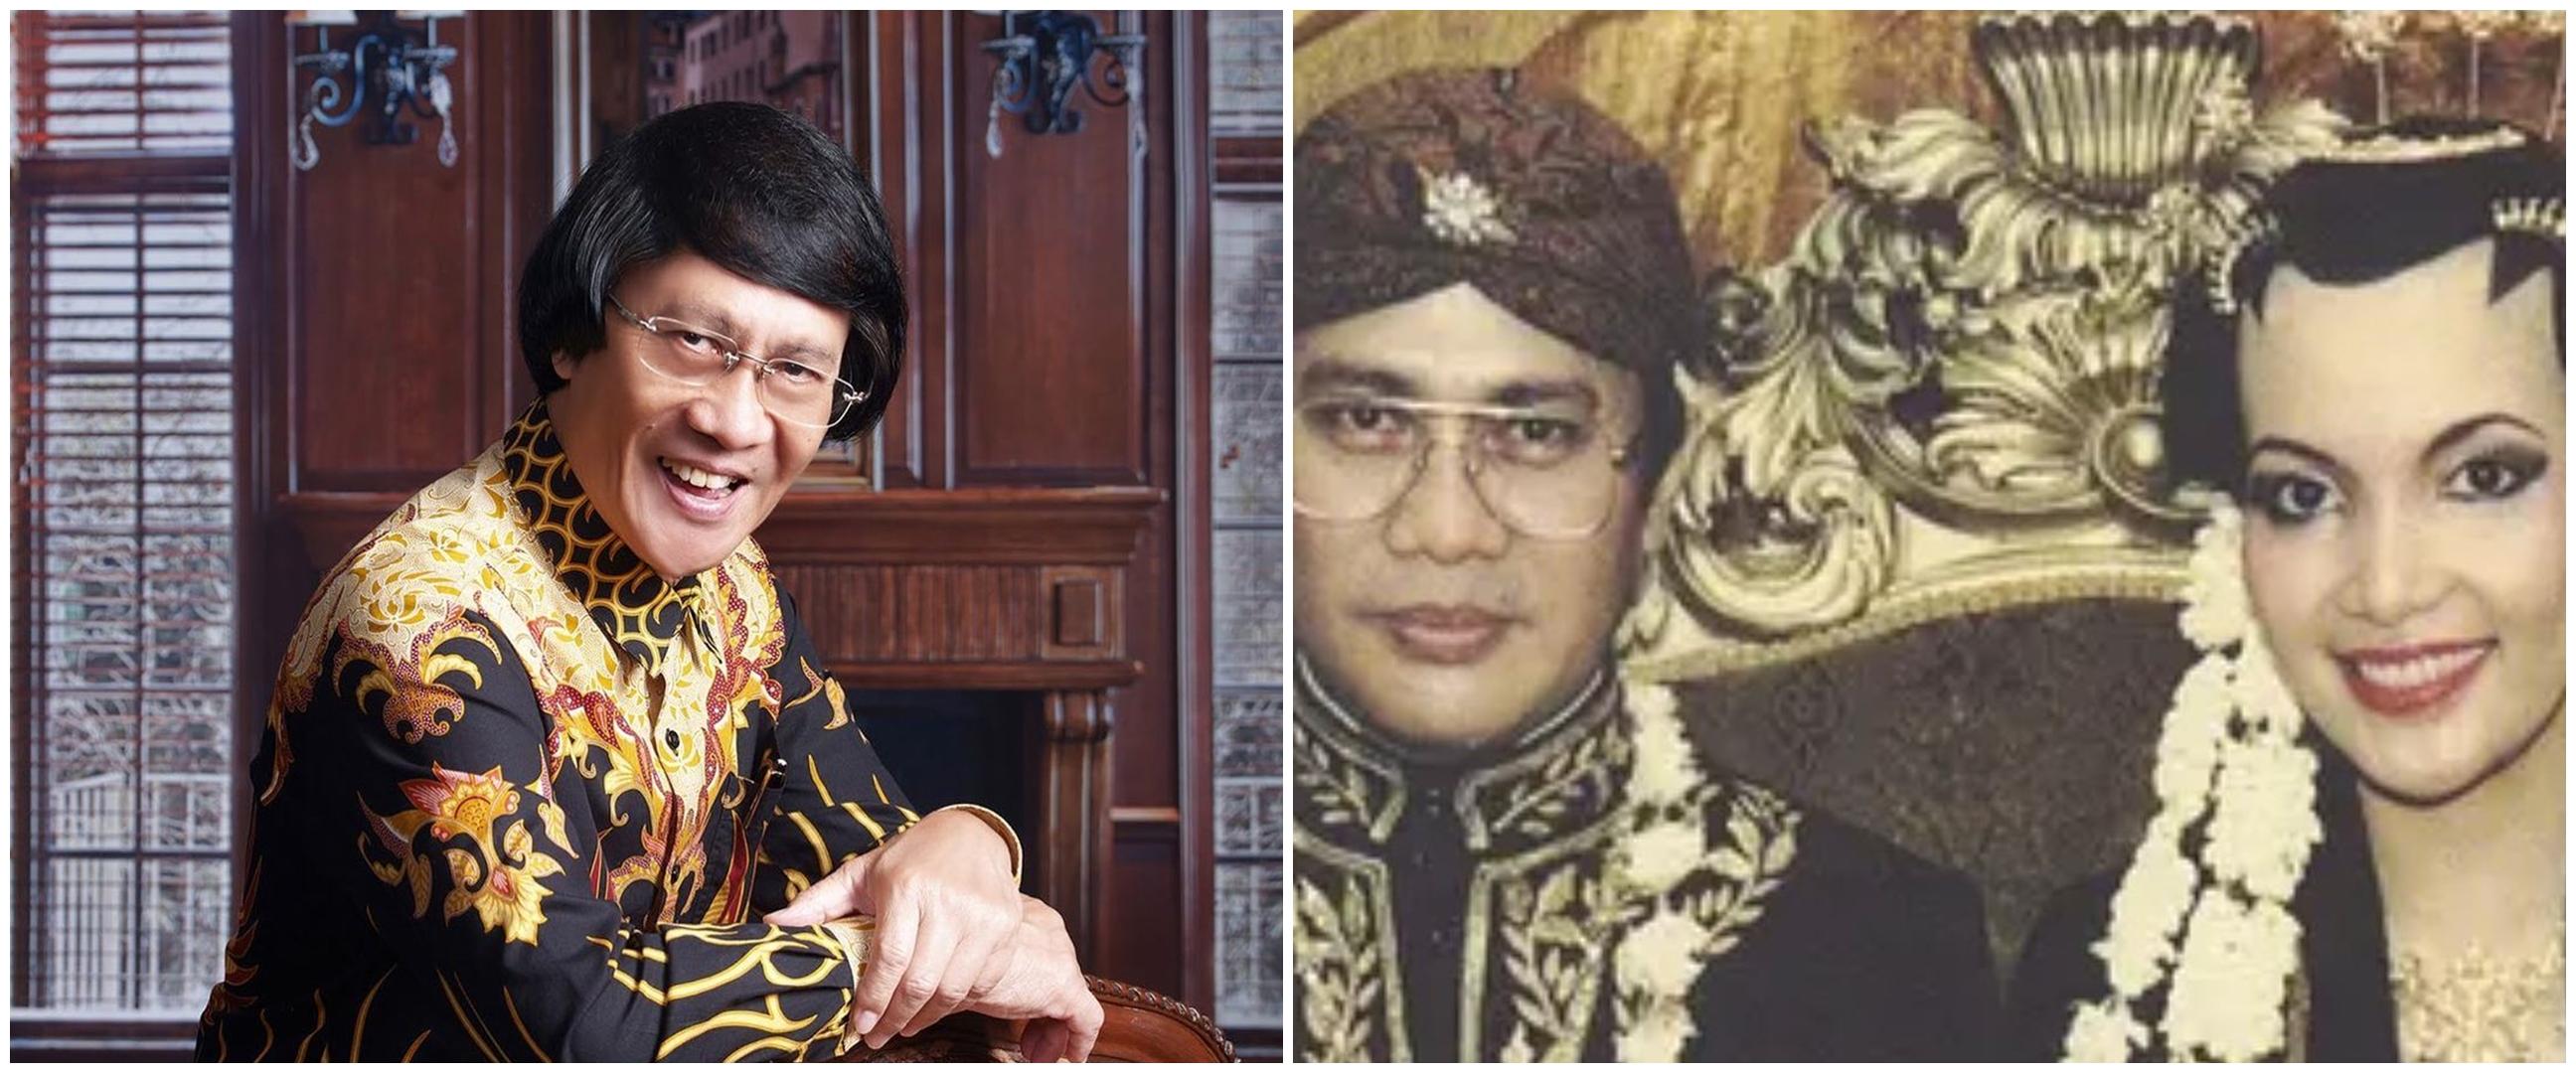 8 Potret harmonis Kak Seto & istri, lebih 30 tahun jalani rumah tangga